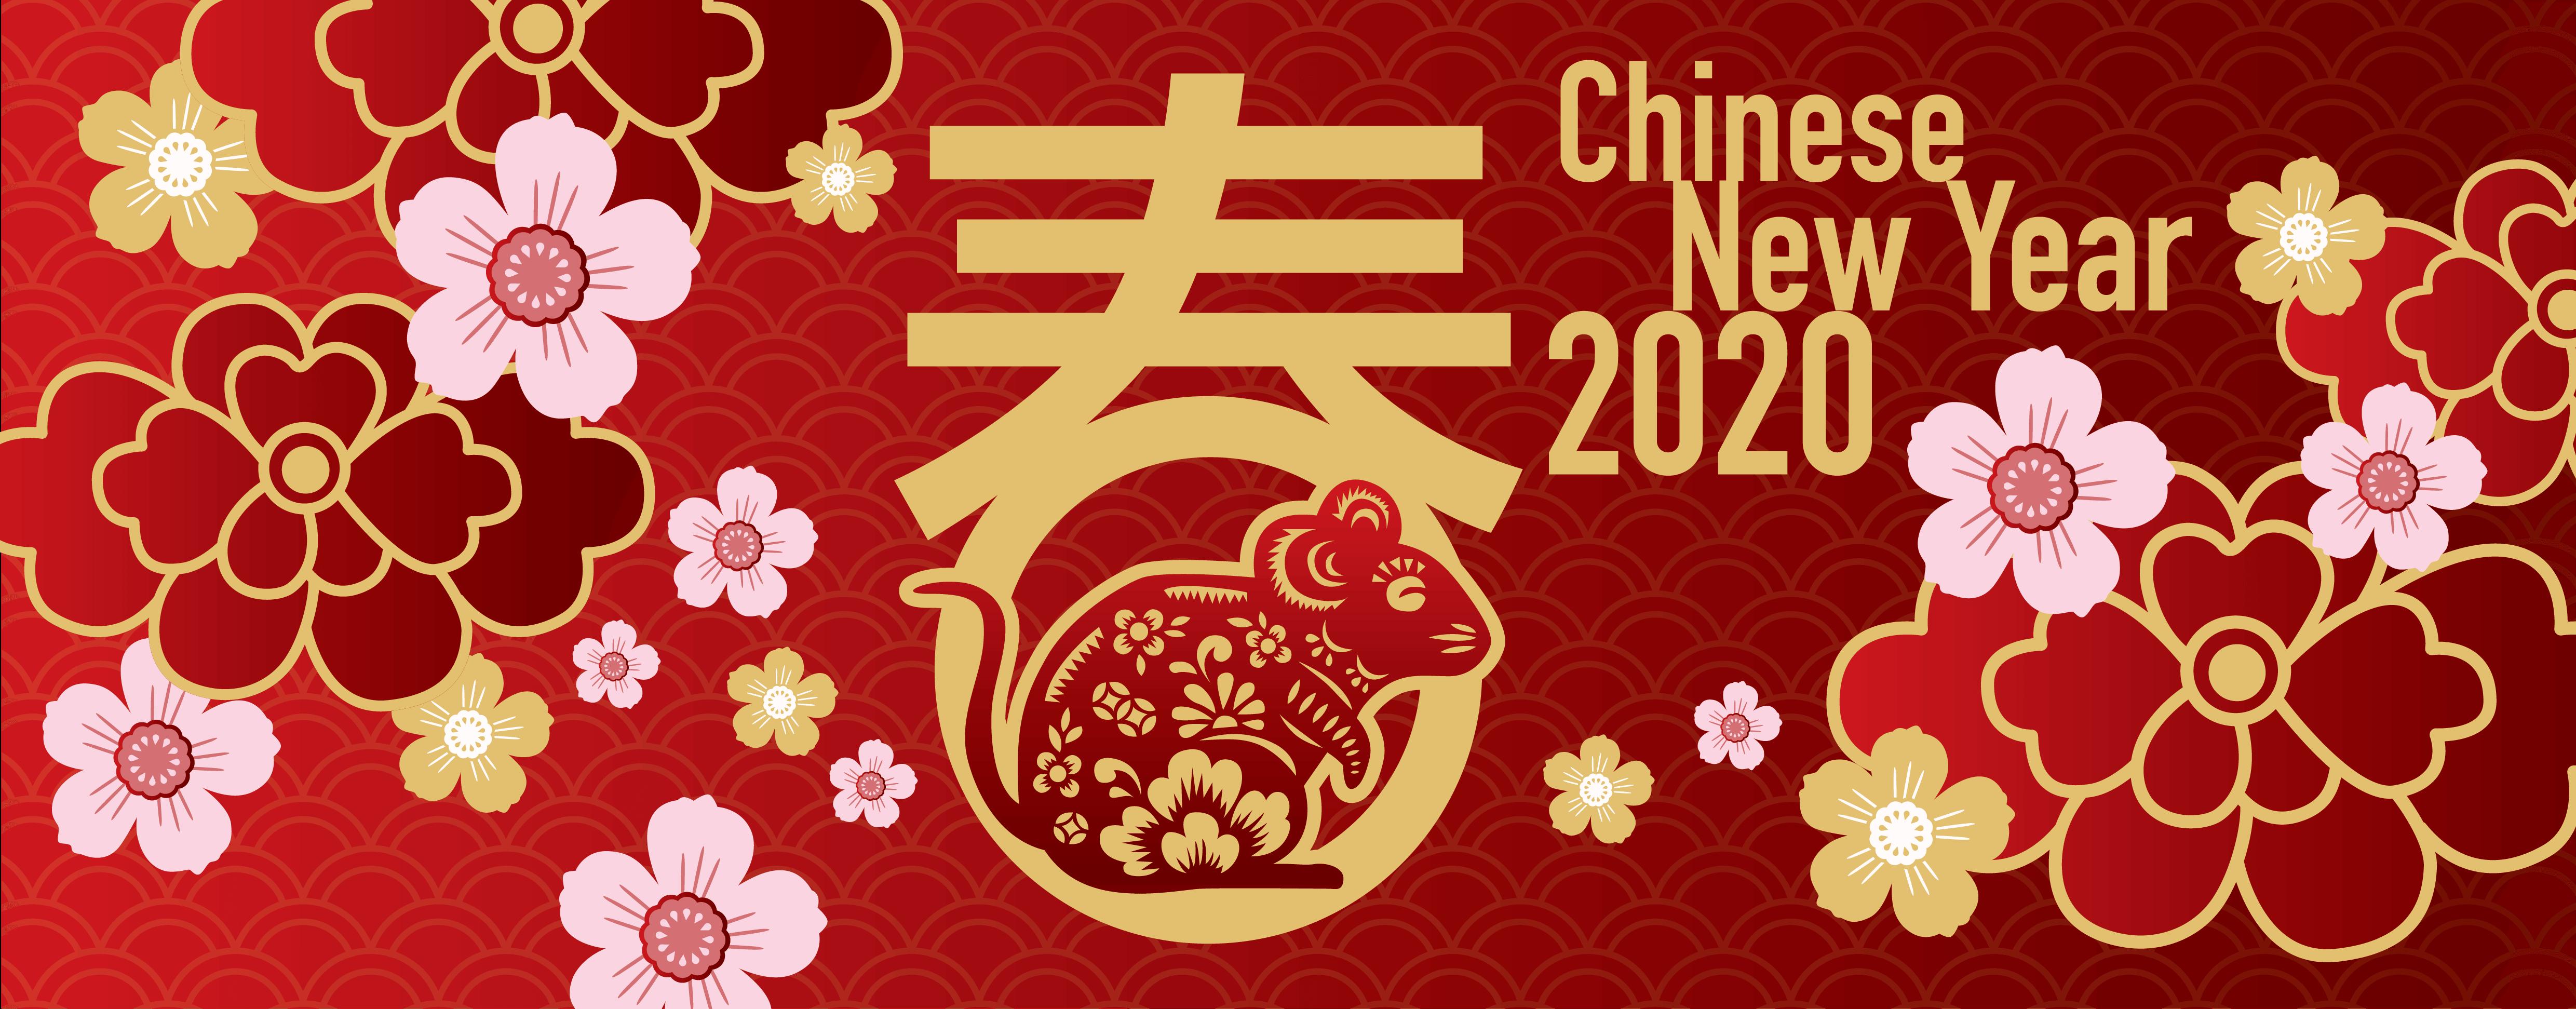 CNY 2020 Banner